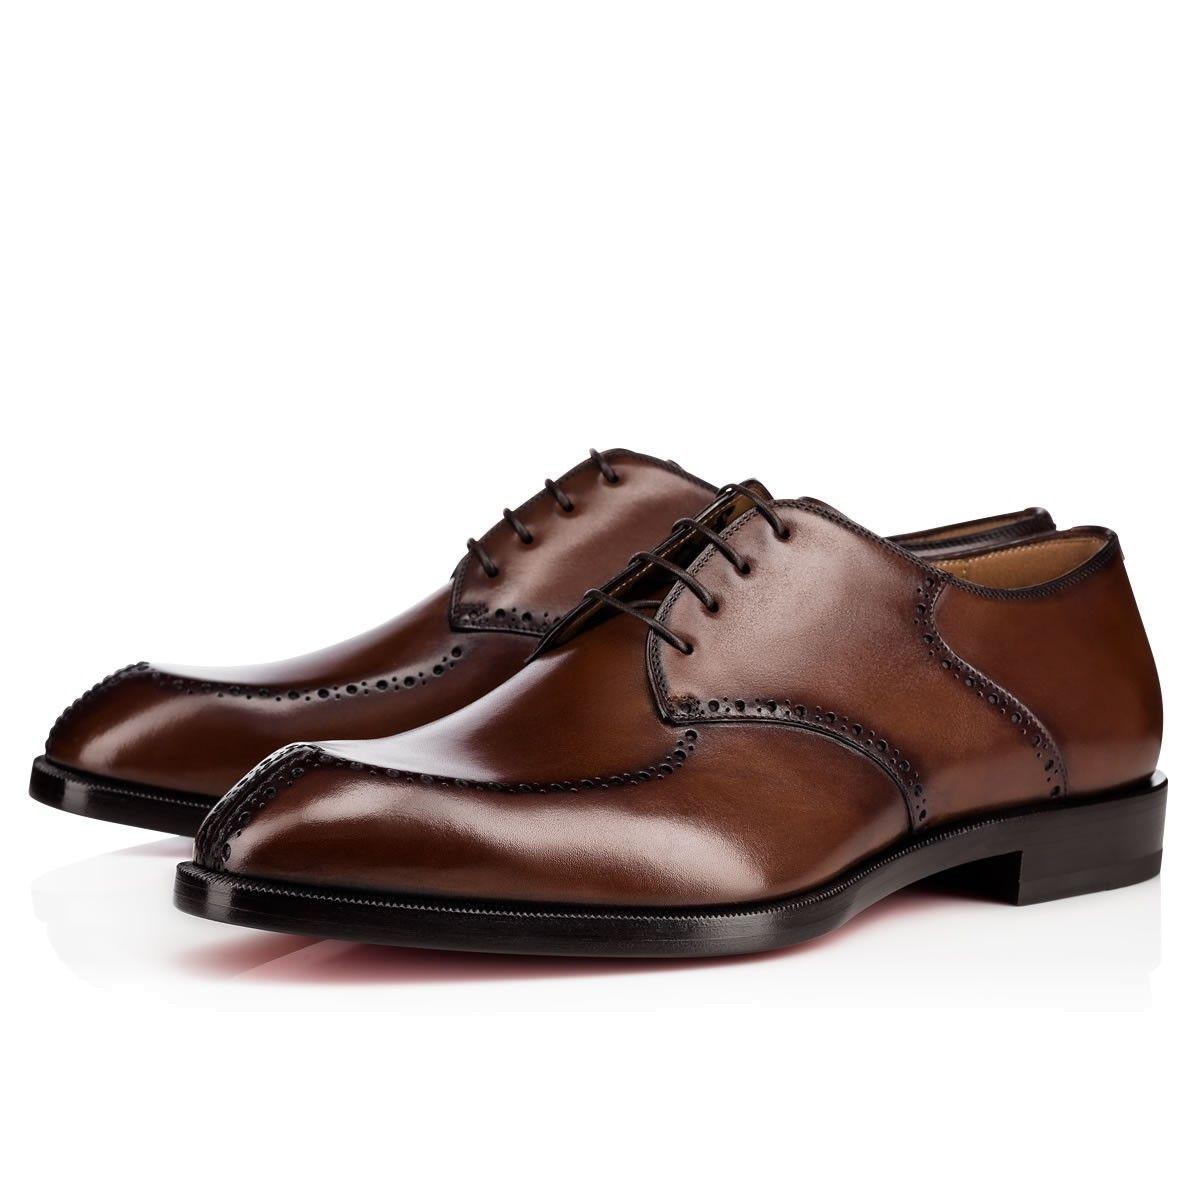 Phil 12, Derbys Homme, Marron (Brown Big Croco/Kudu Wax/Hairon/Chocolate(1,5,8)/Wood(2,6,7)/DK. Brown(3)/Tan(4)/Aspen Navy), 41 EUMelvin & Hamilton